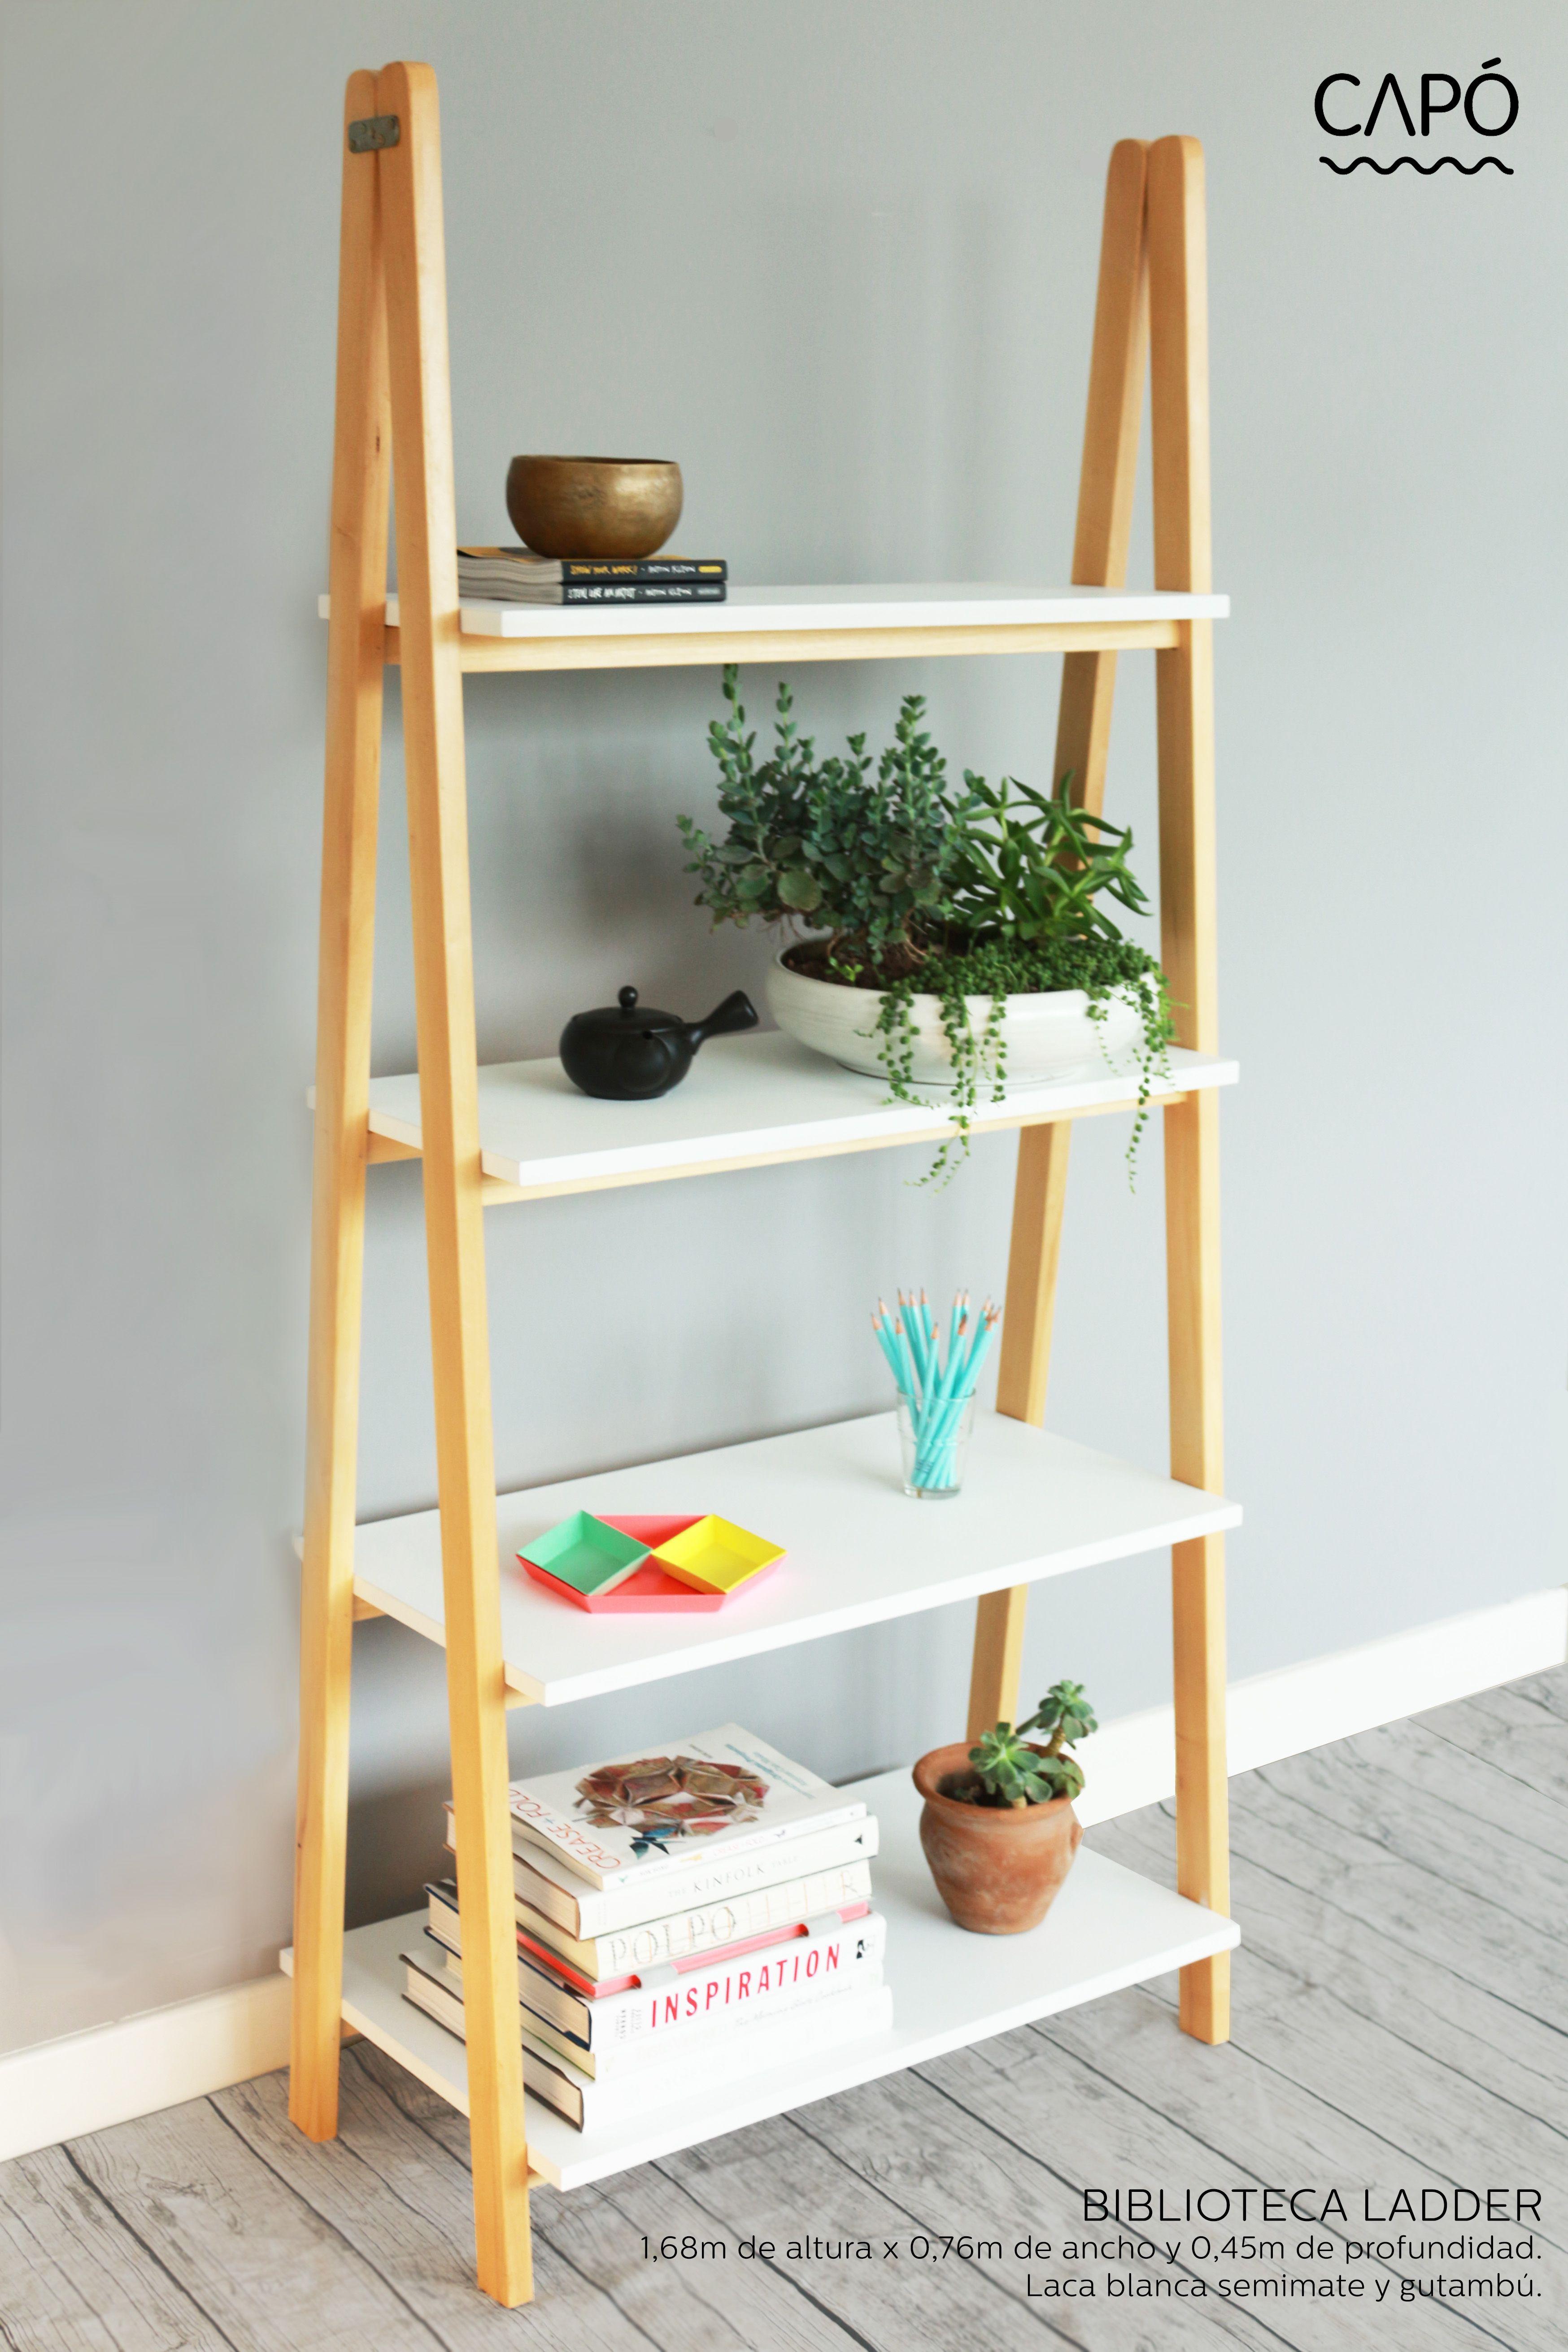 Repisa ladder muebles y objetos cap cap pinterest for Repisa escalera